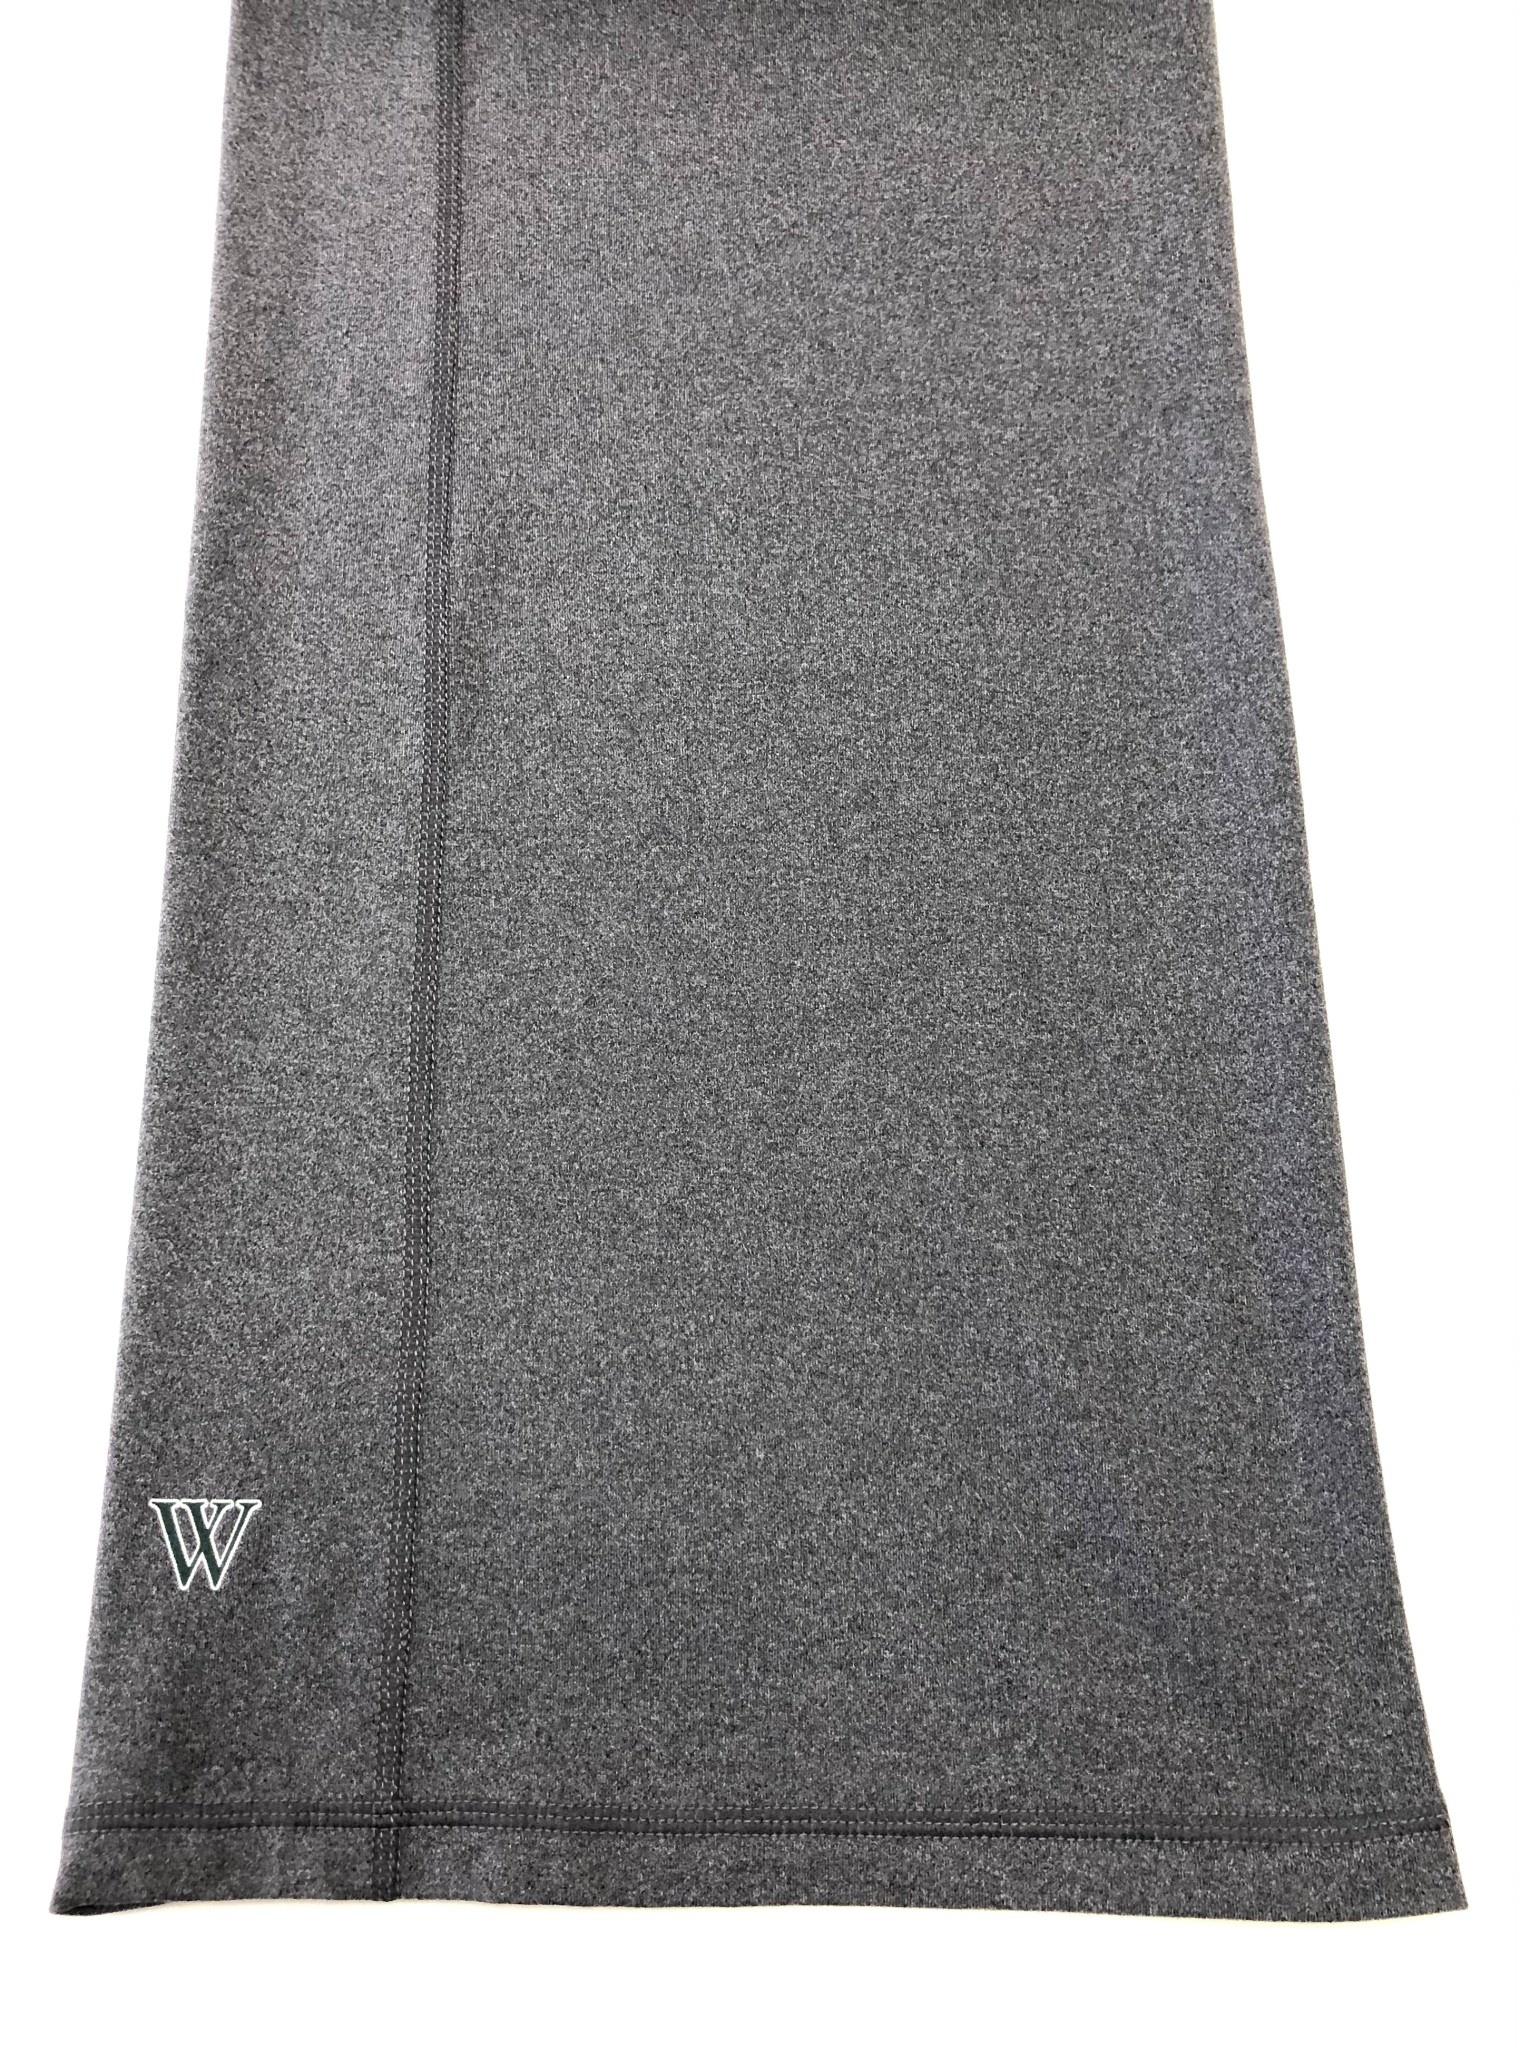 Under Armour Pant: UA XL Gray Yoga Pant